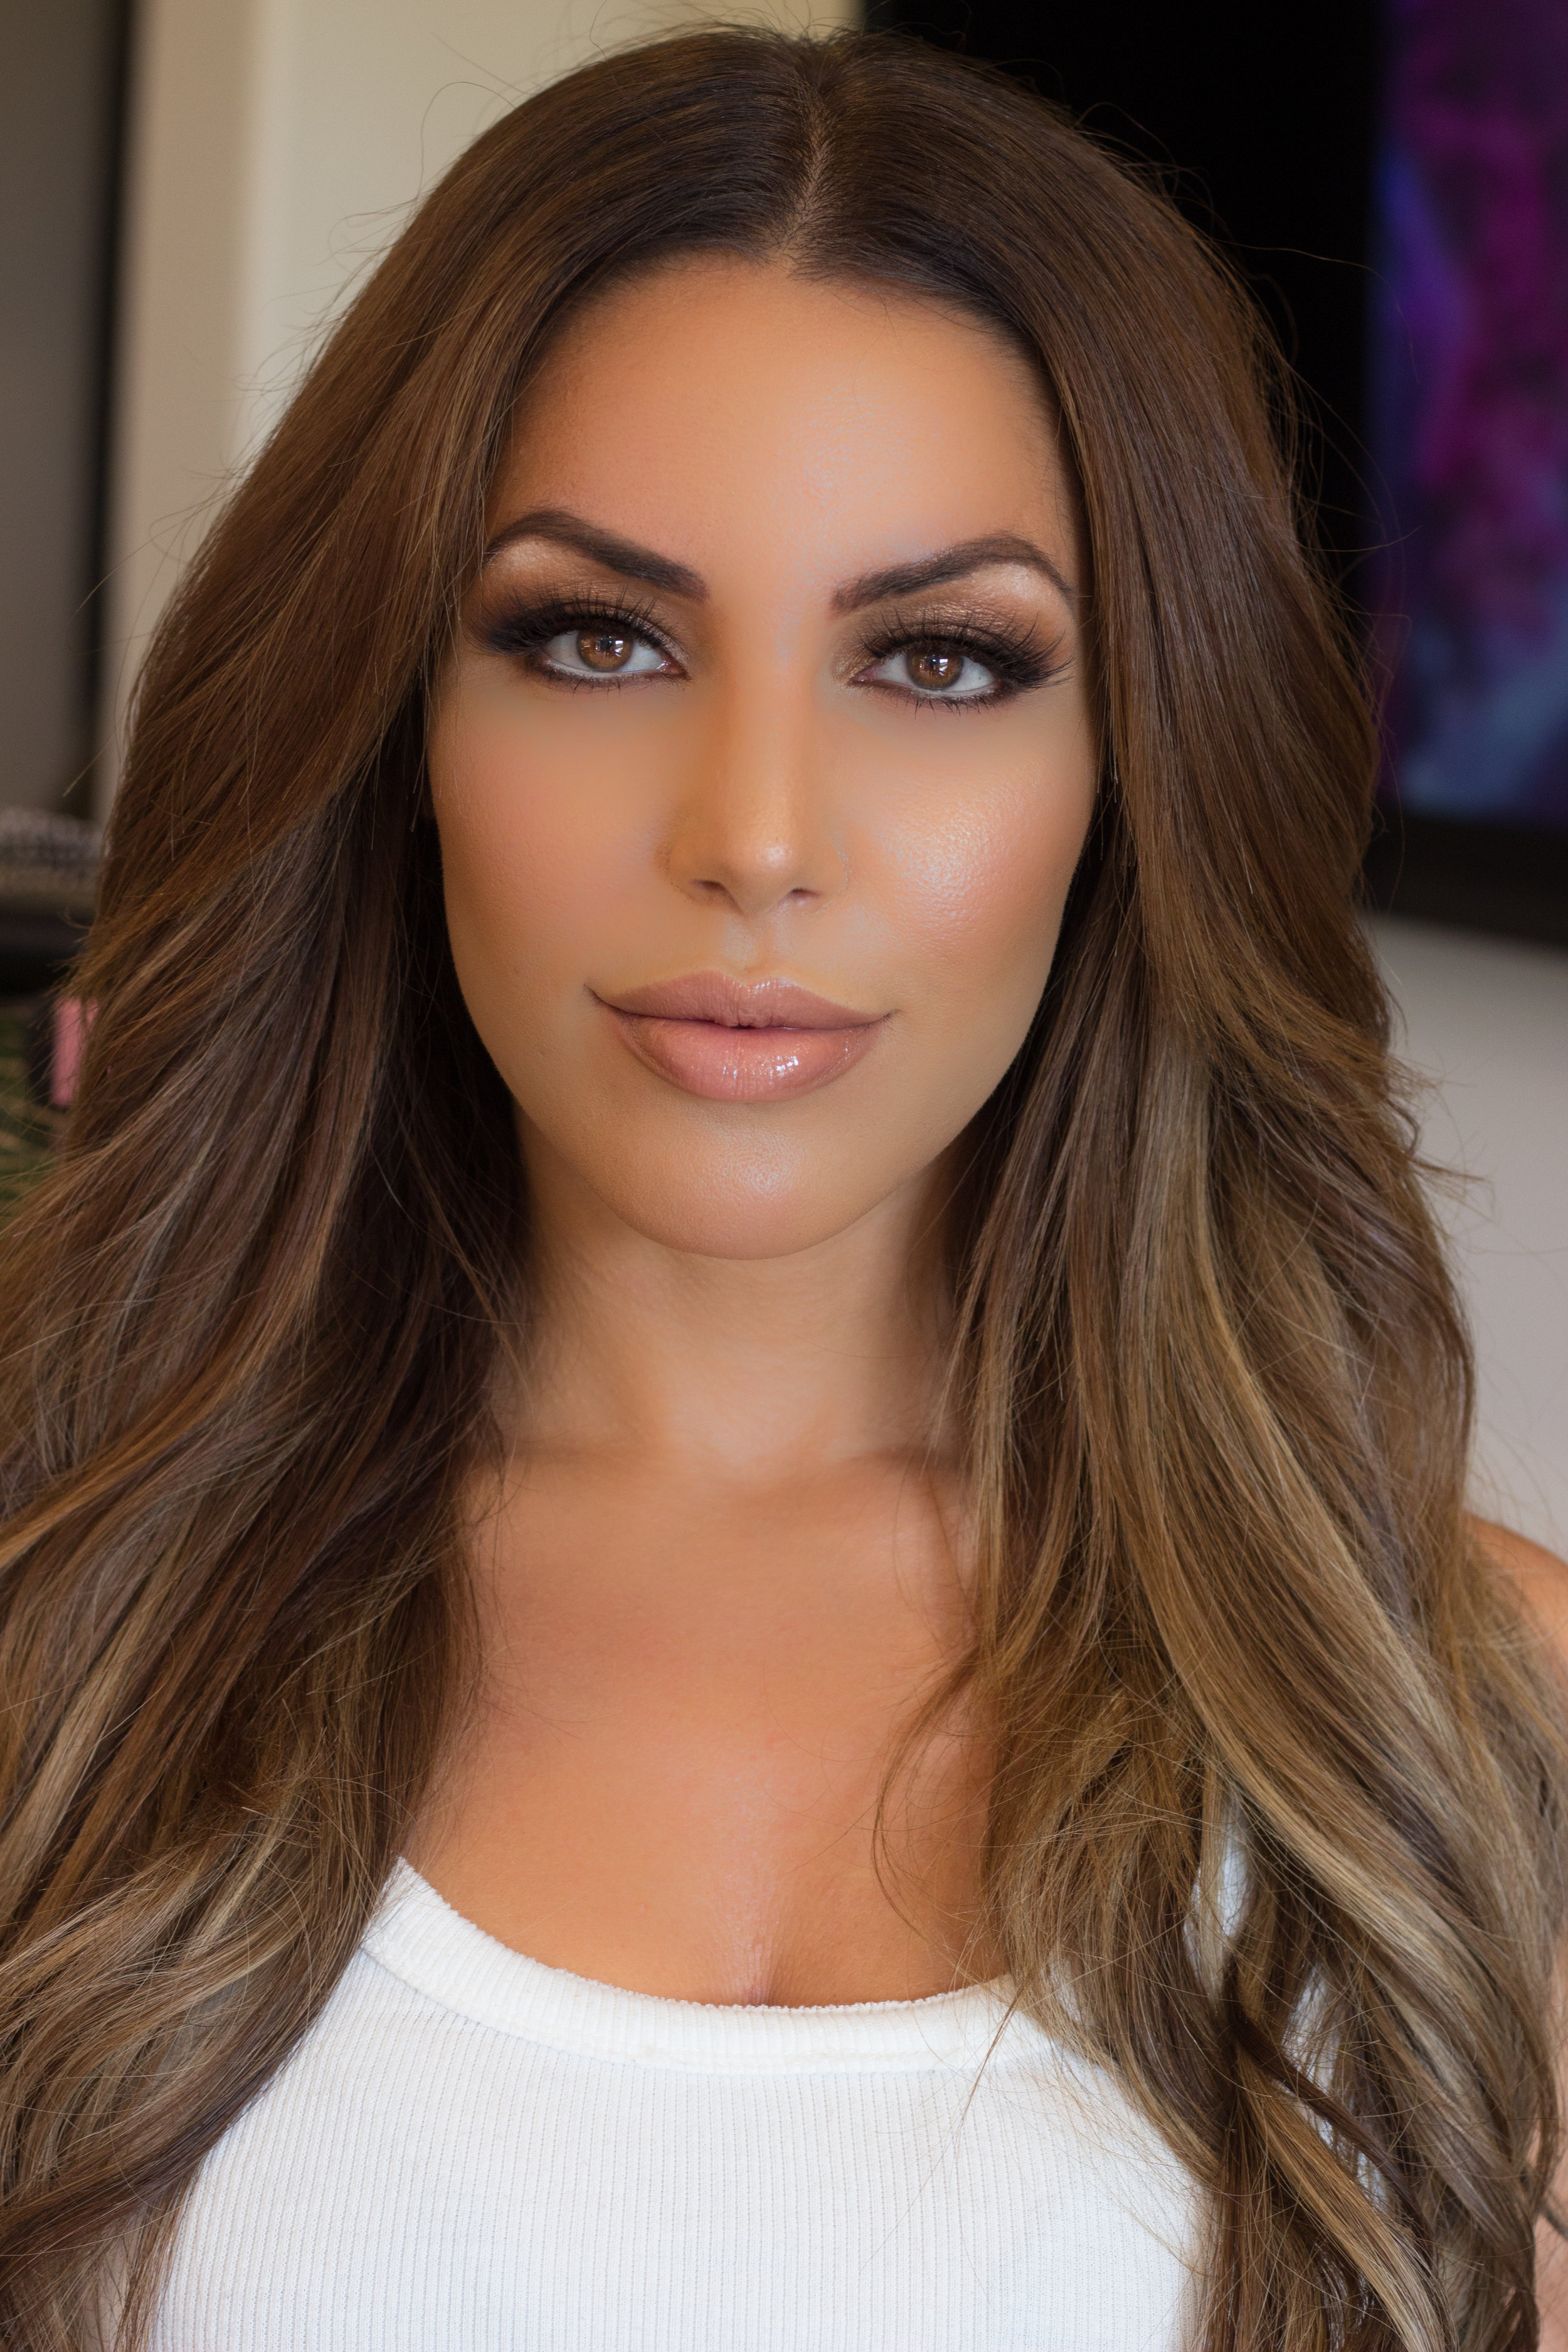 Makeup & Hair by Hannah Elisabeth